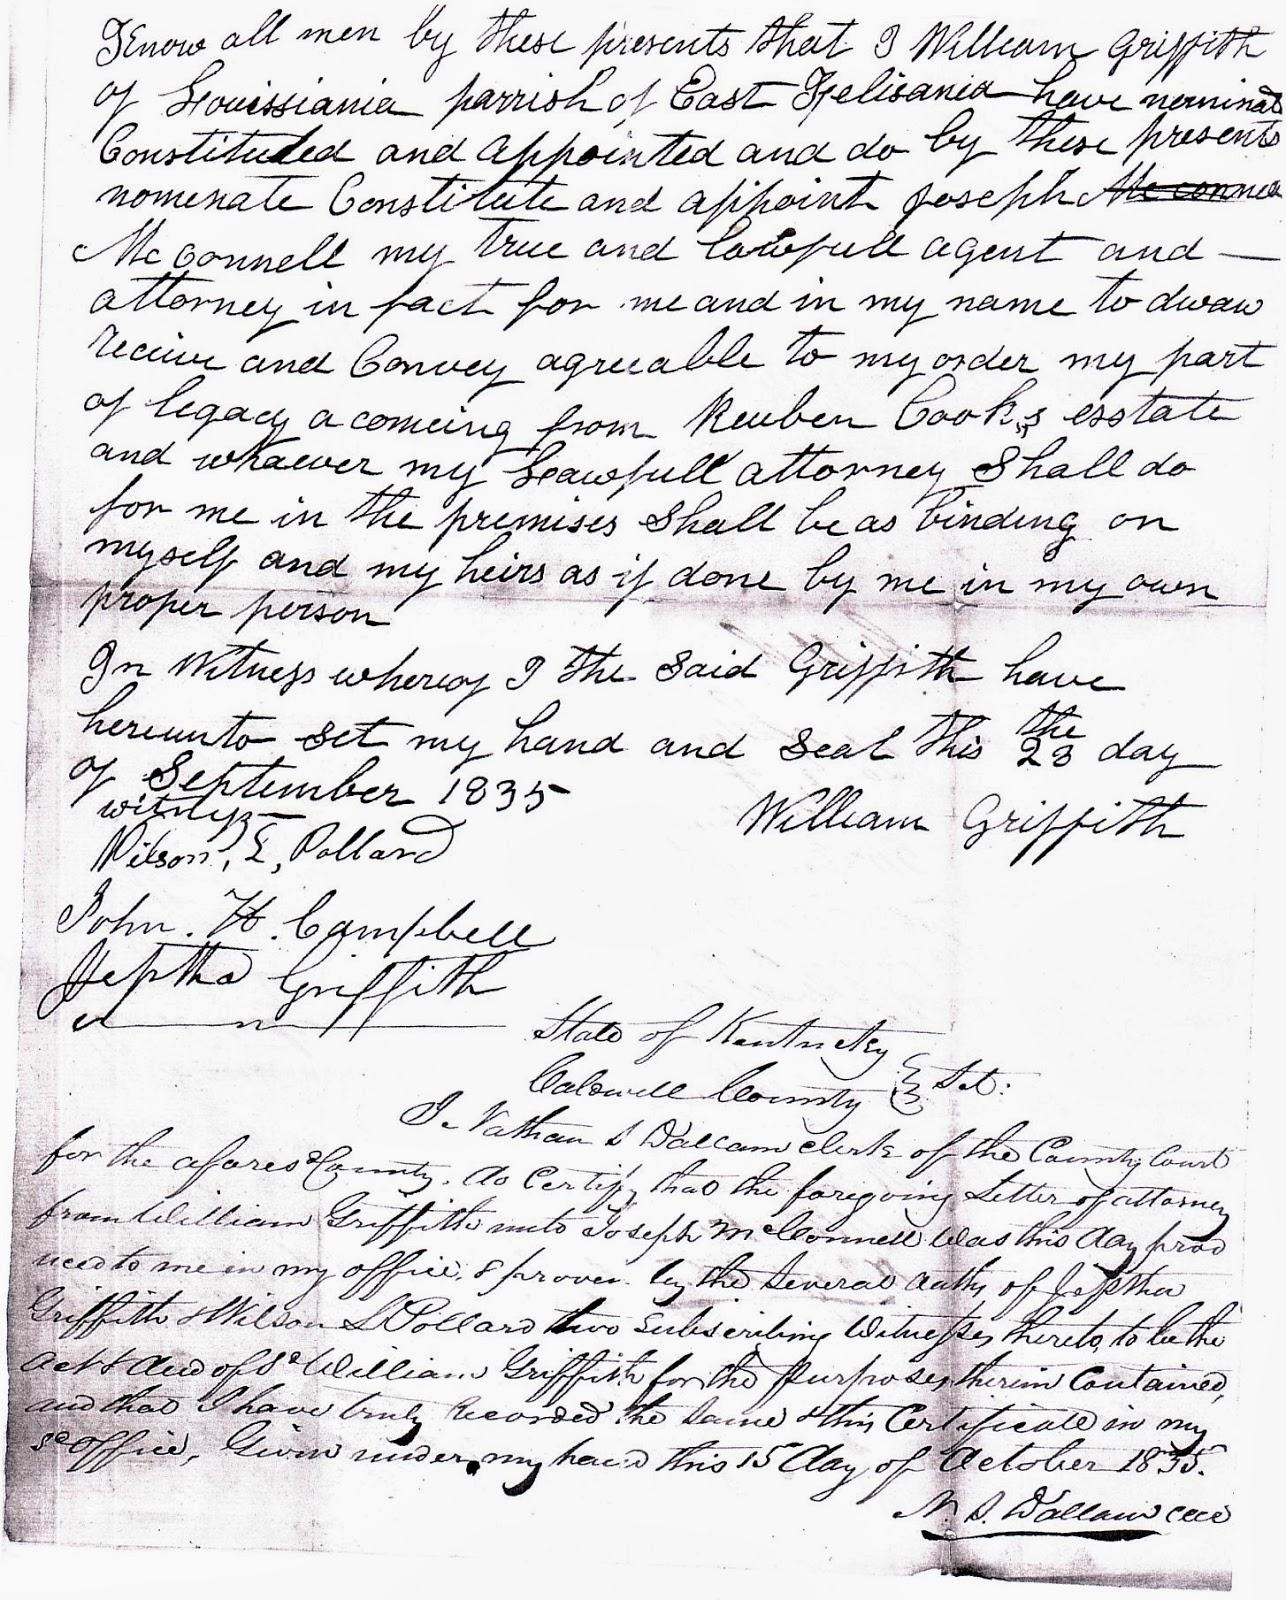 Western Kentucky Genealogy Blog: Power of Attorney